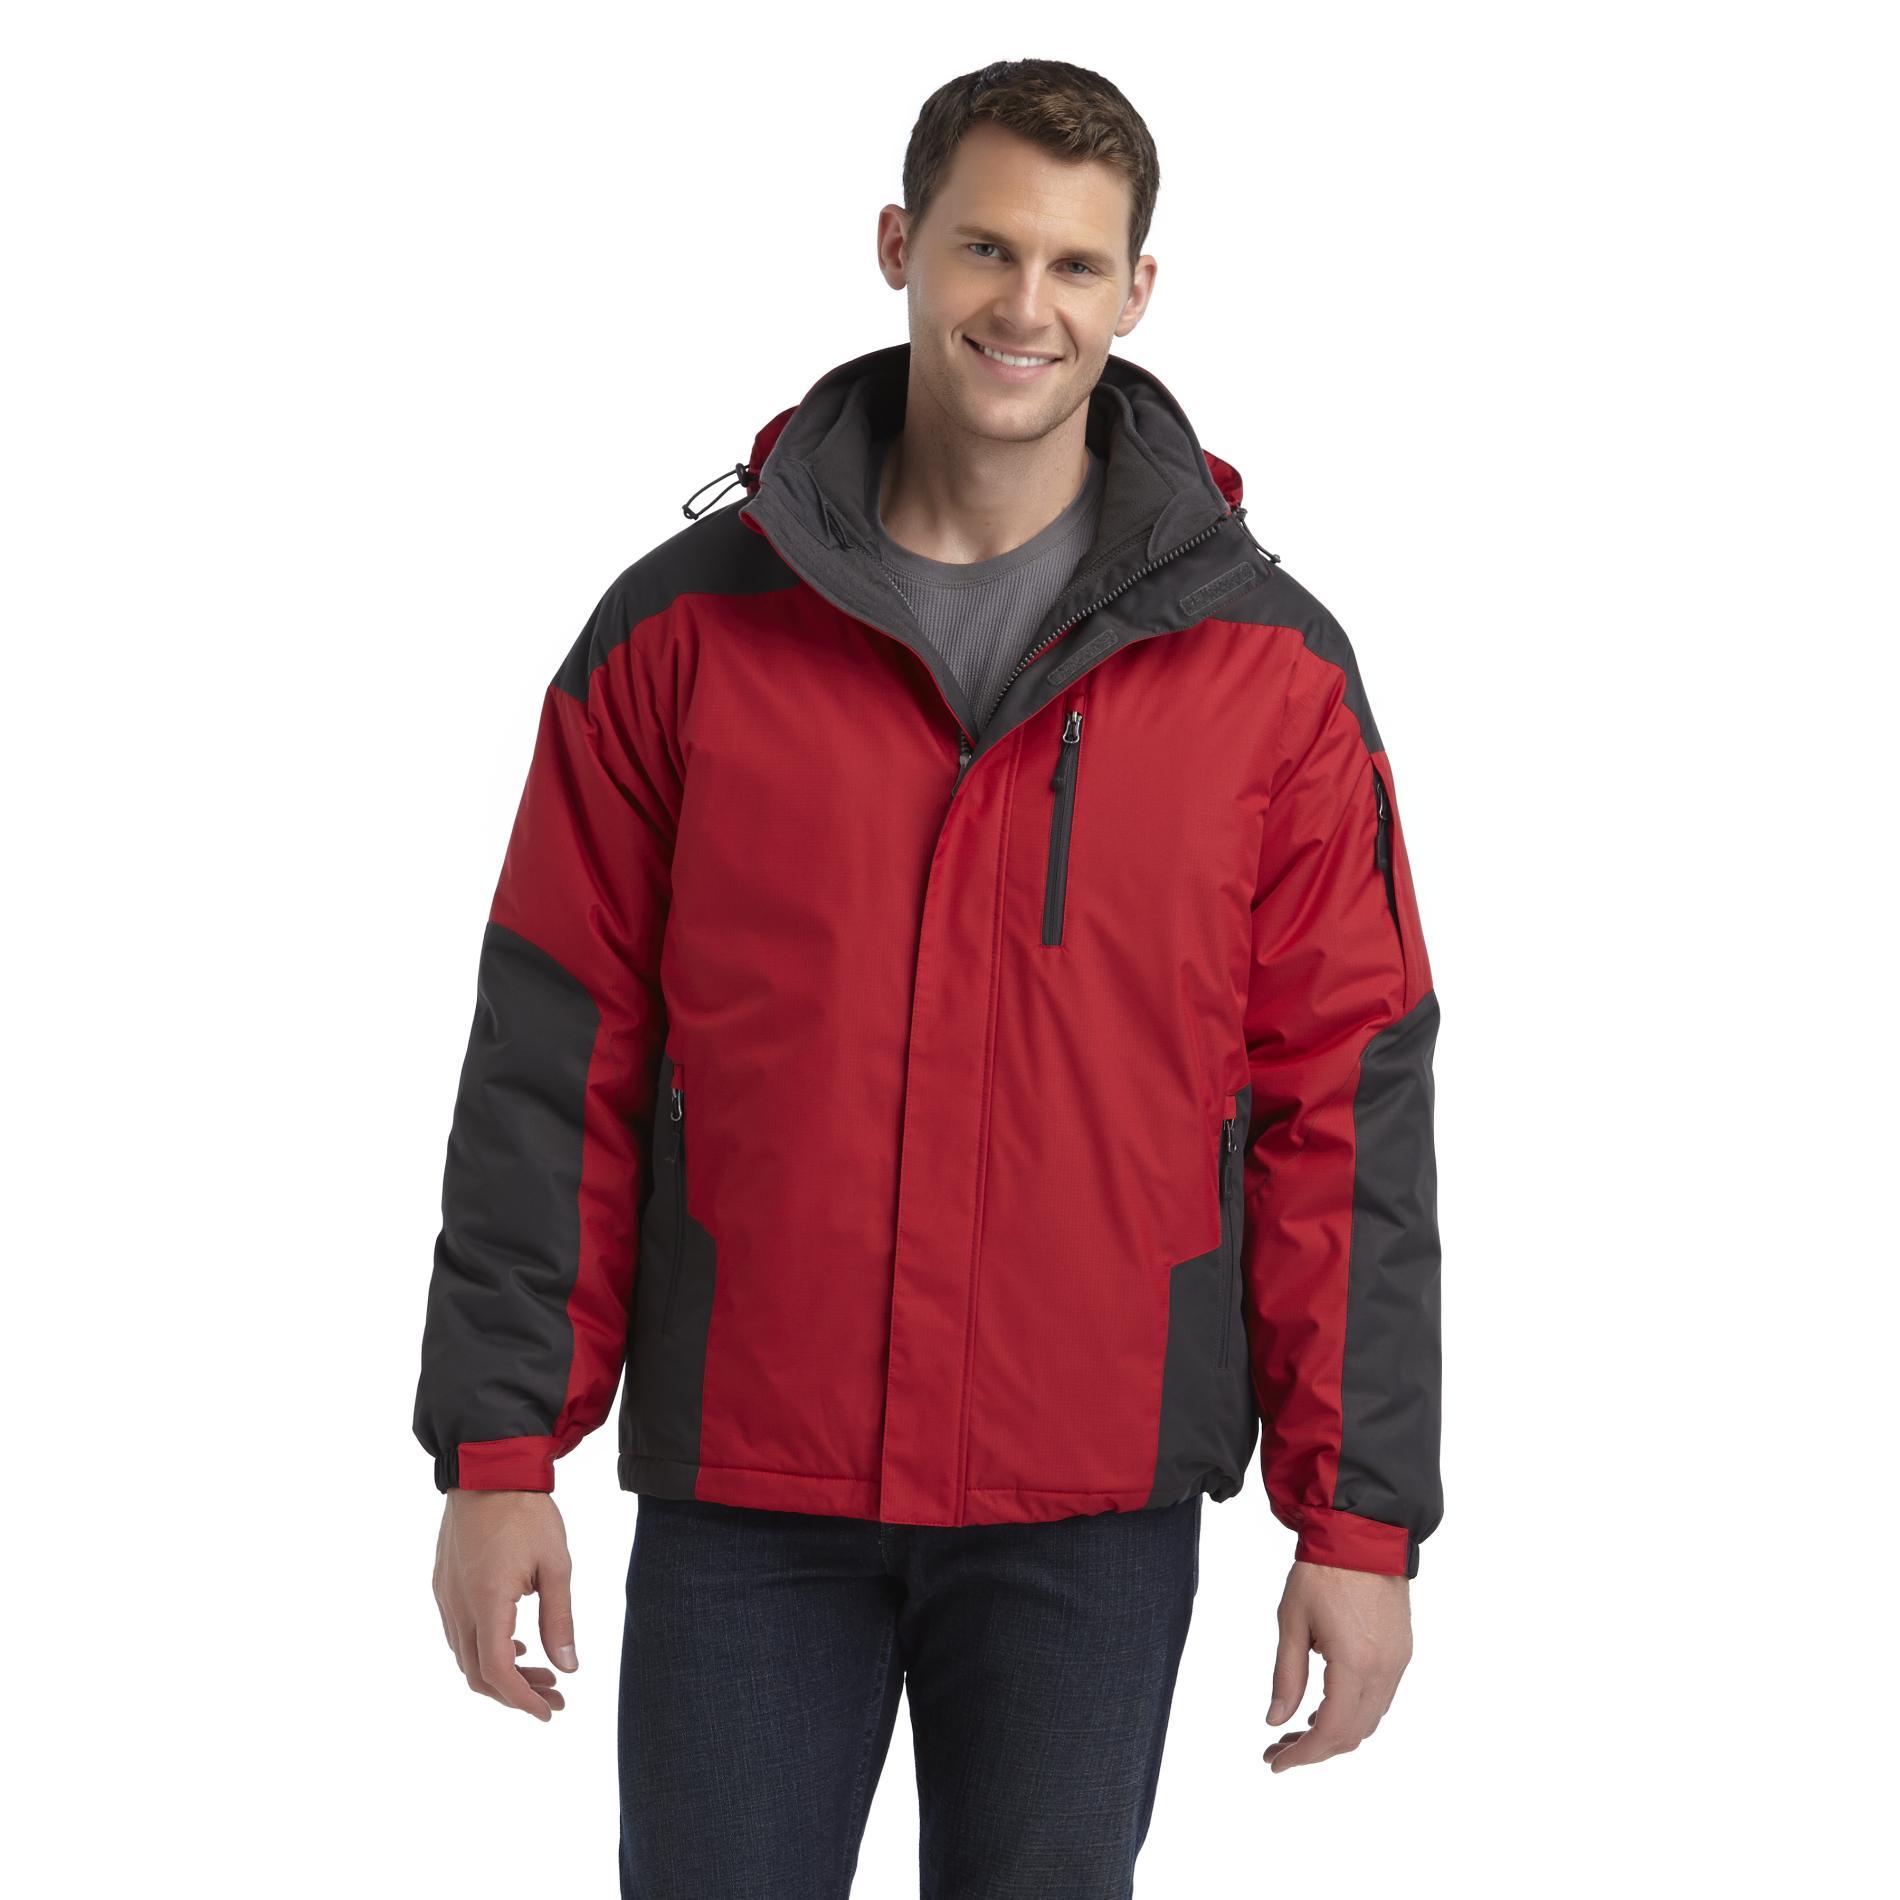 Athletech Men's 3-in-1 Winter Jacket - Colorblock at Kmart.com